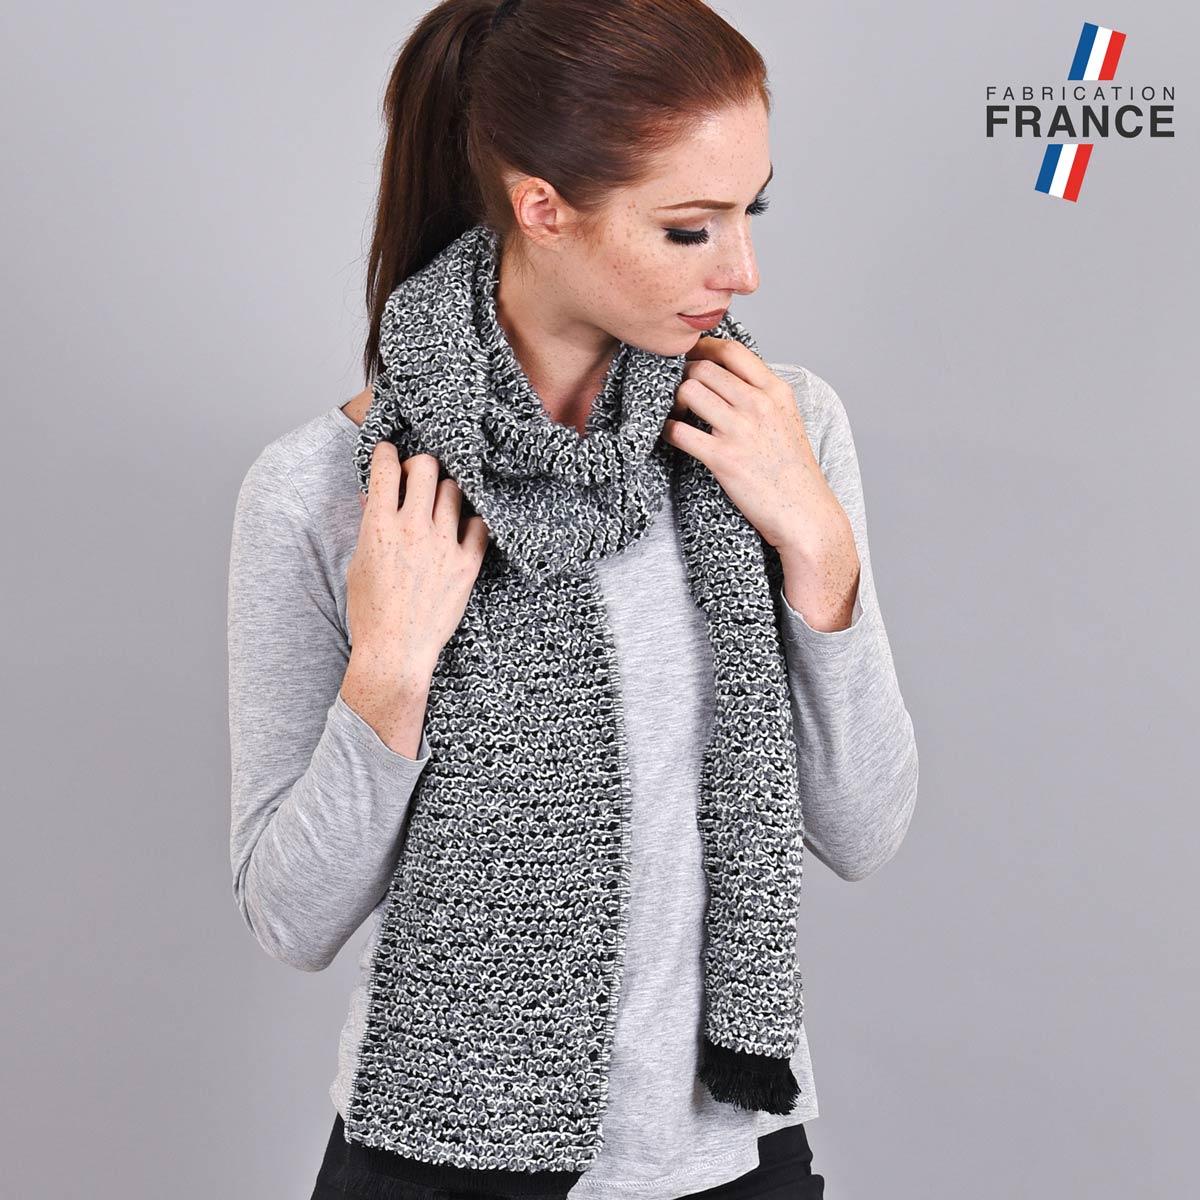 AT-05694_W12-1FR_Echarpe-femme-fabrication-france-gris